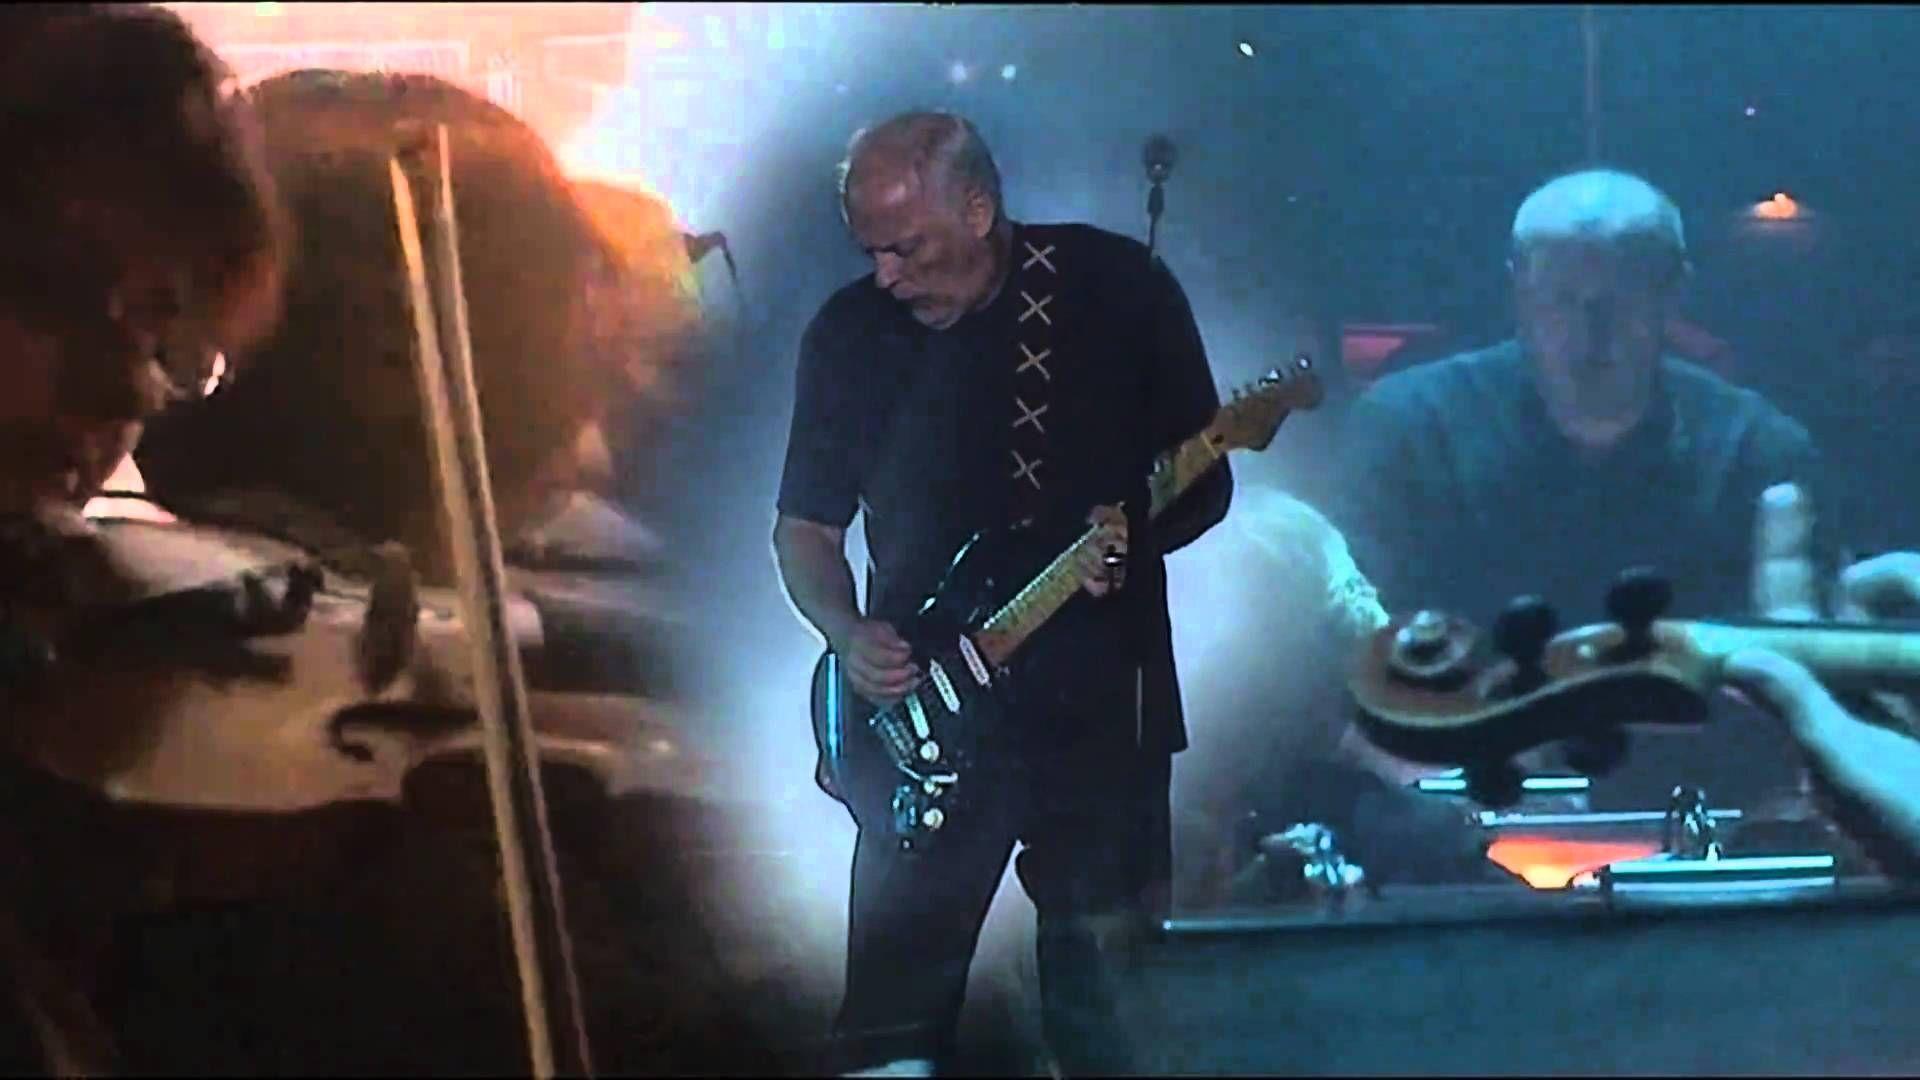 David Gilmour Comfortably Numb Guitar Solo In Hd David Gilmour Comfortably Numb Pink Floyd